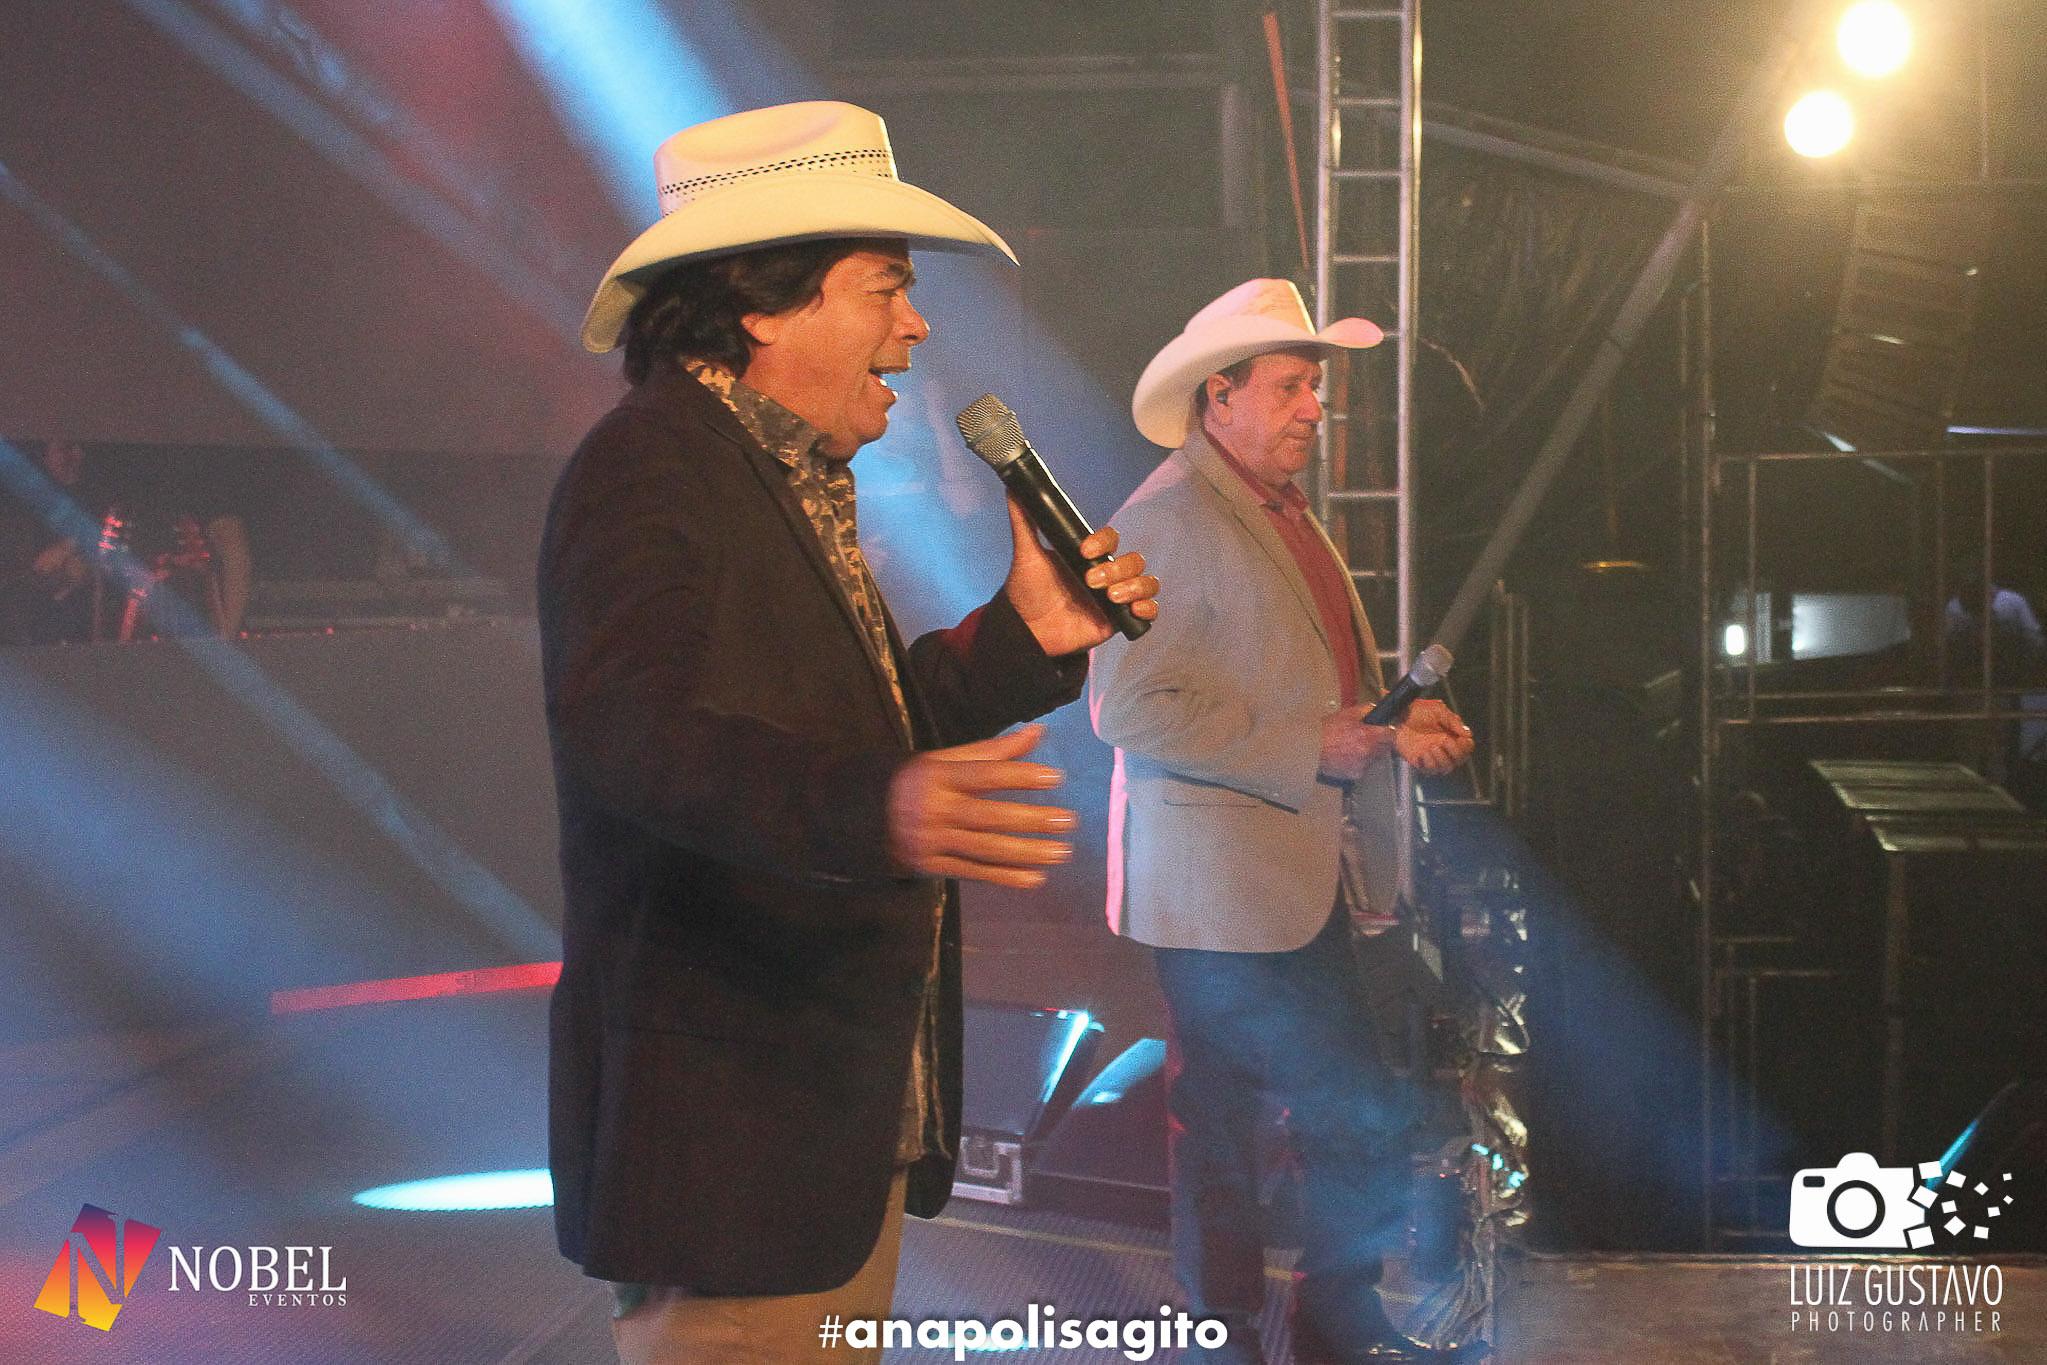 Luiz Gustavo Photographer-209